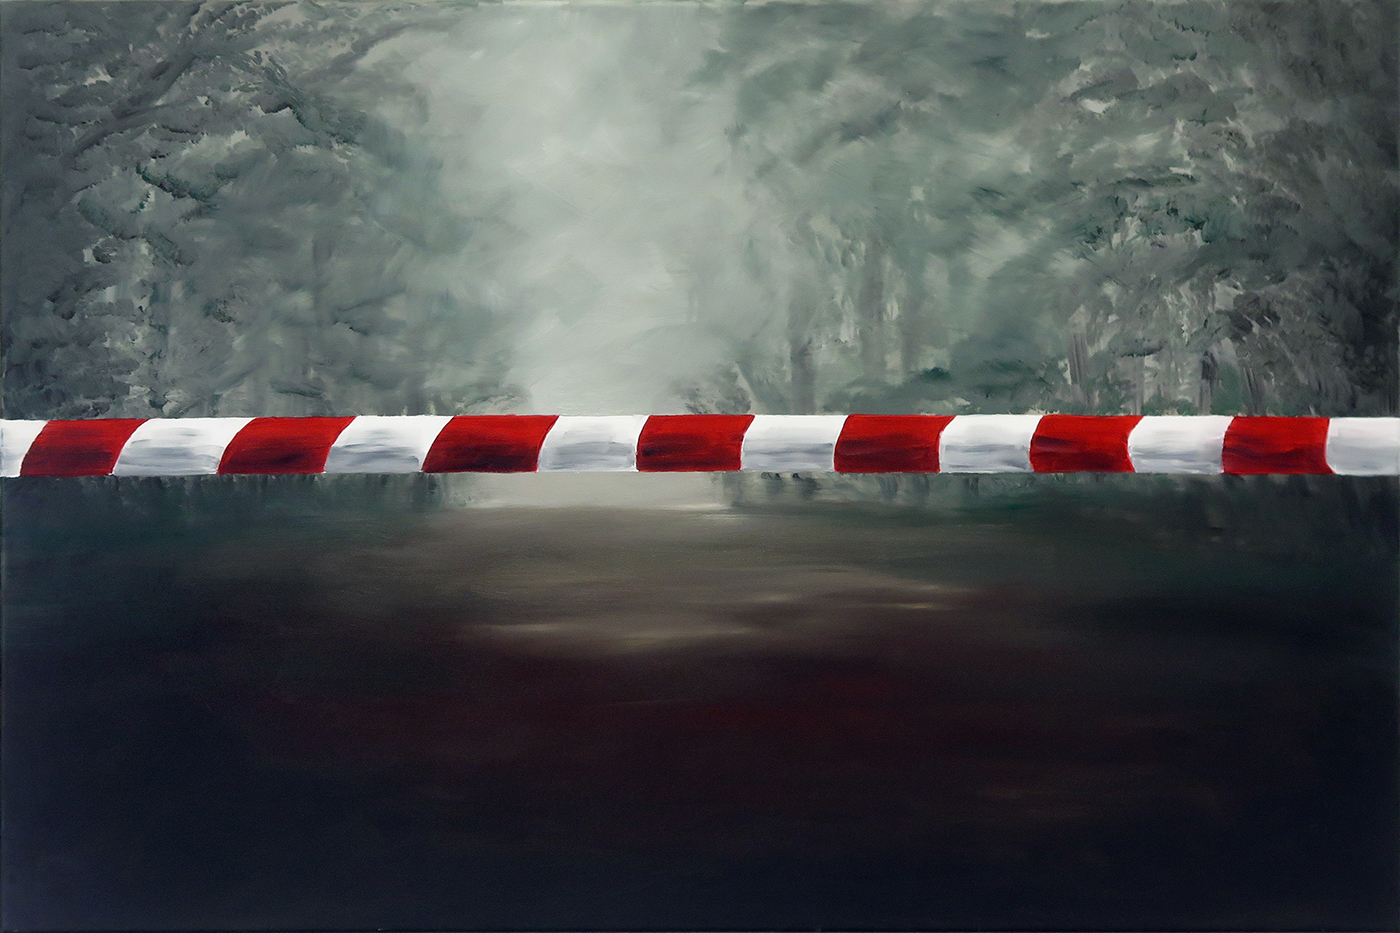 Forbidden, óleo sobre tela, 80 x 120 cm, 2021